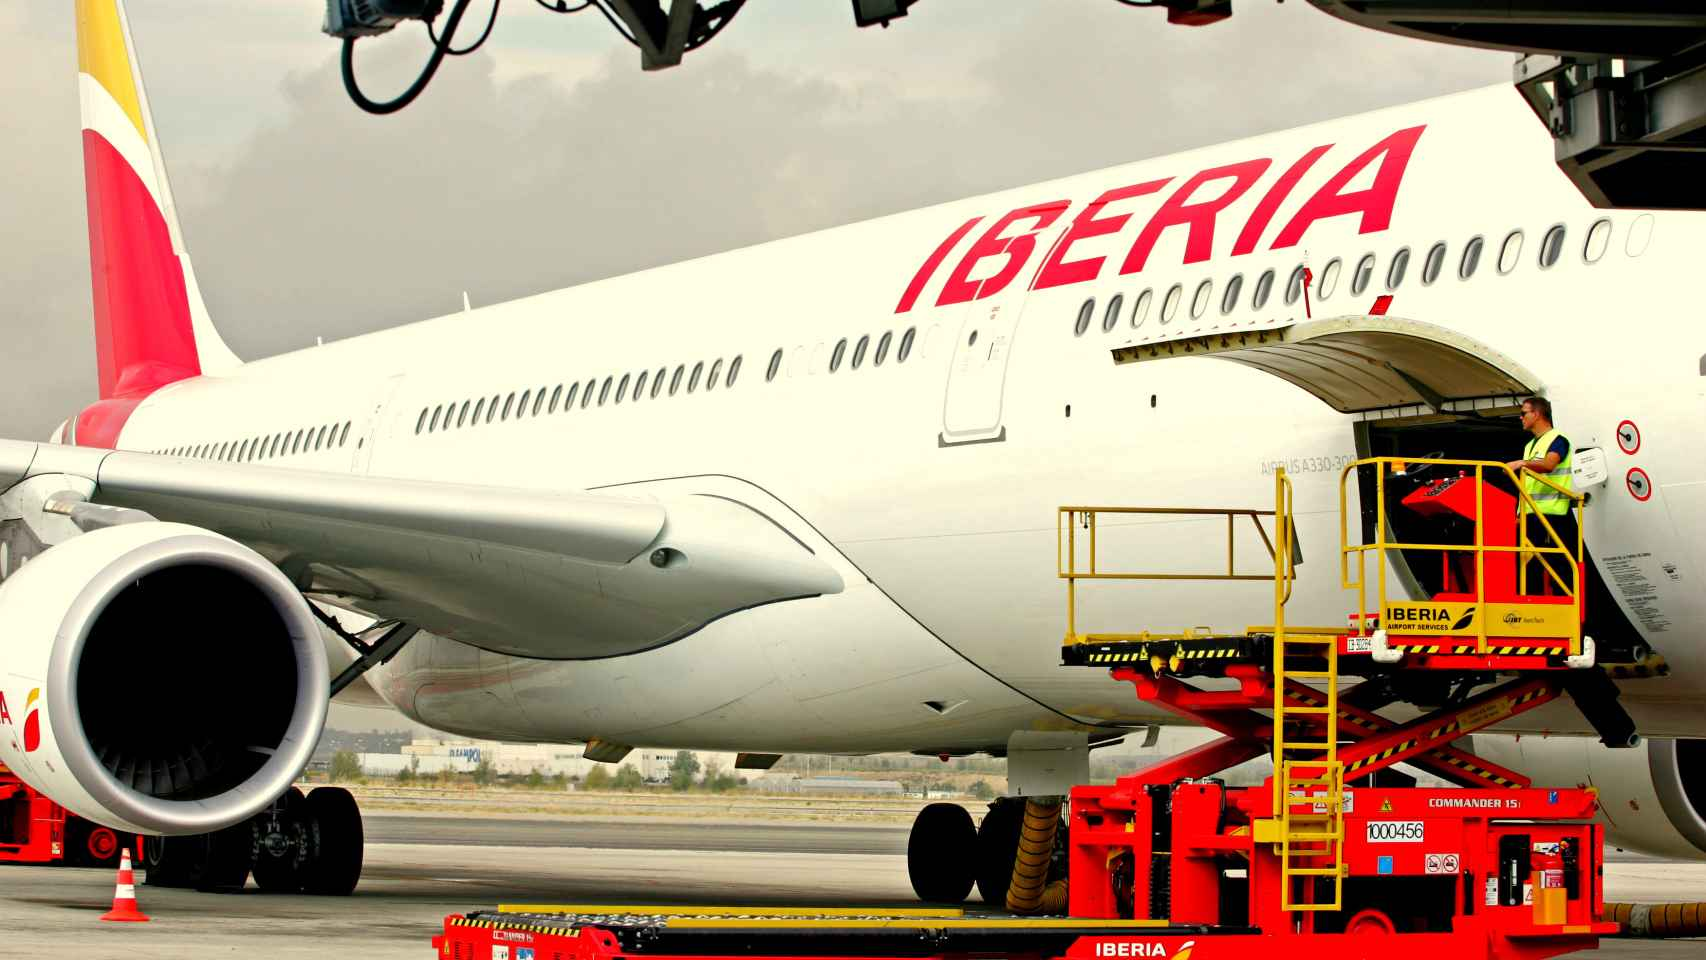 Un avión de Iberia (IAG) carga en un aeropuerto antes de iniciar su vuelo.